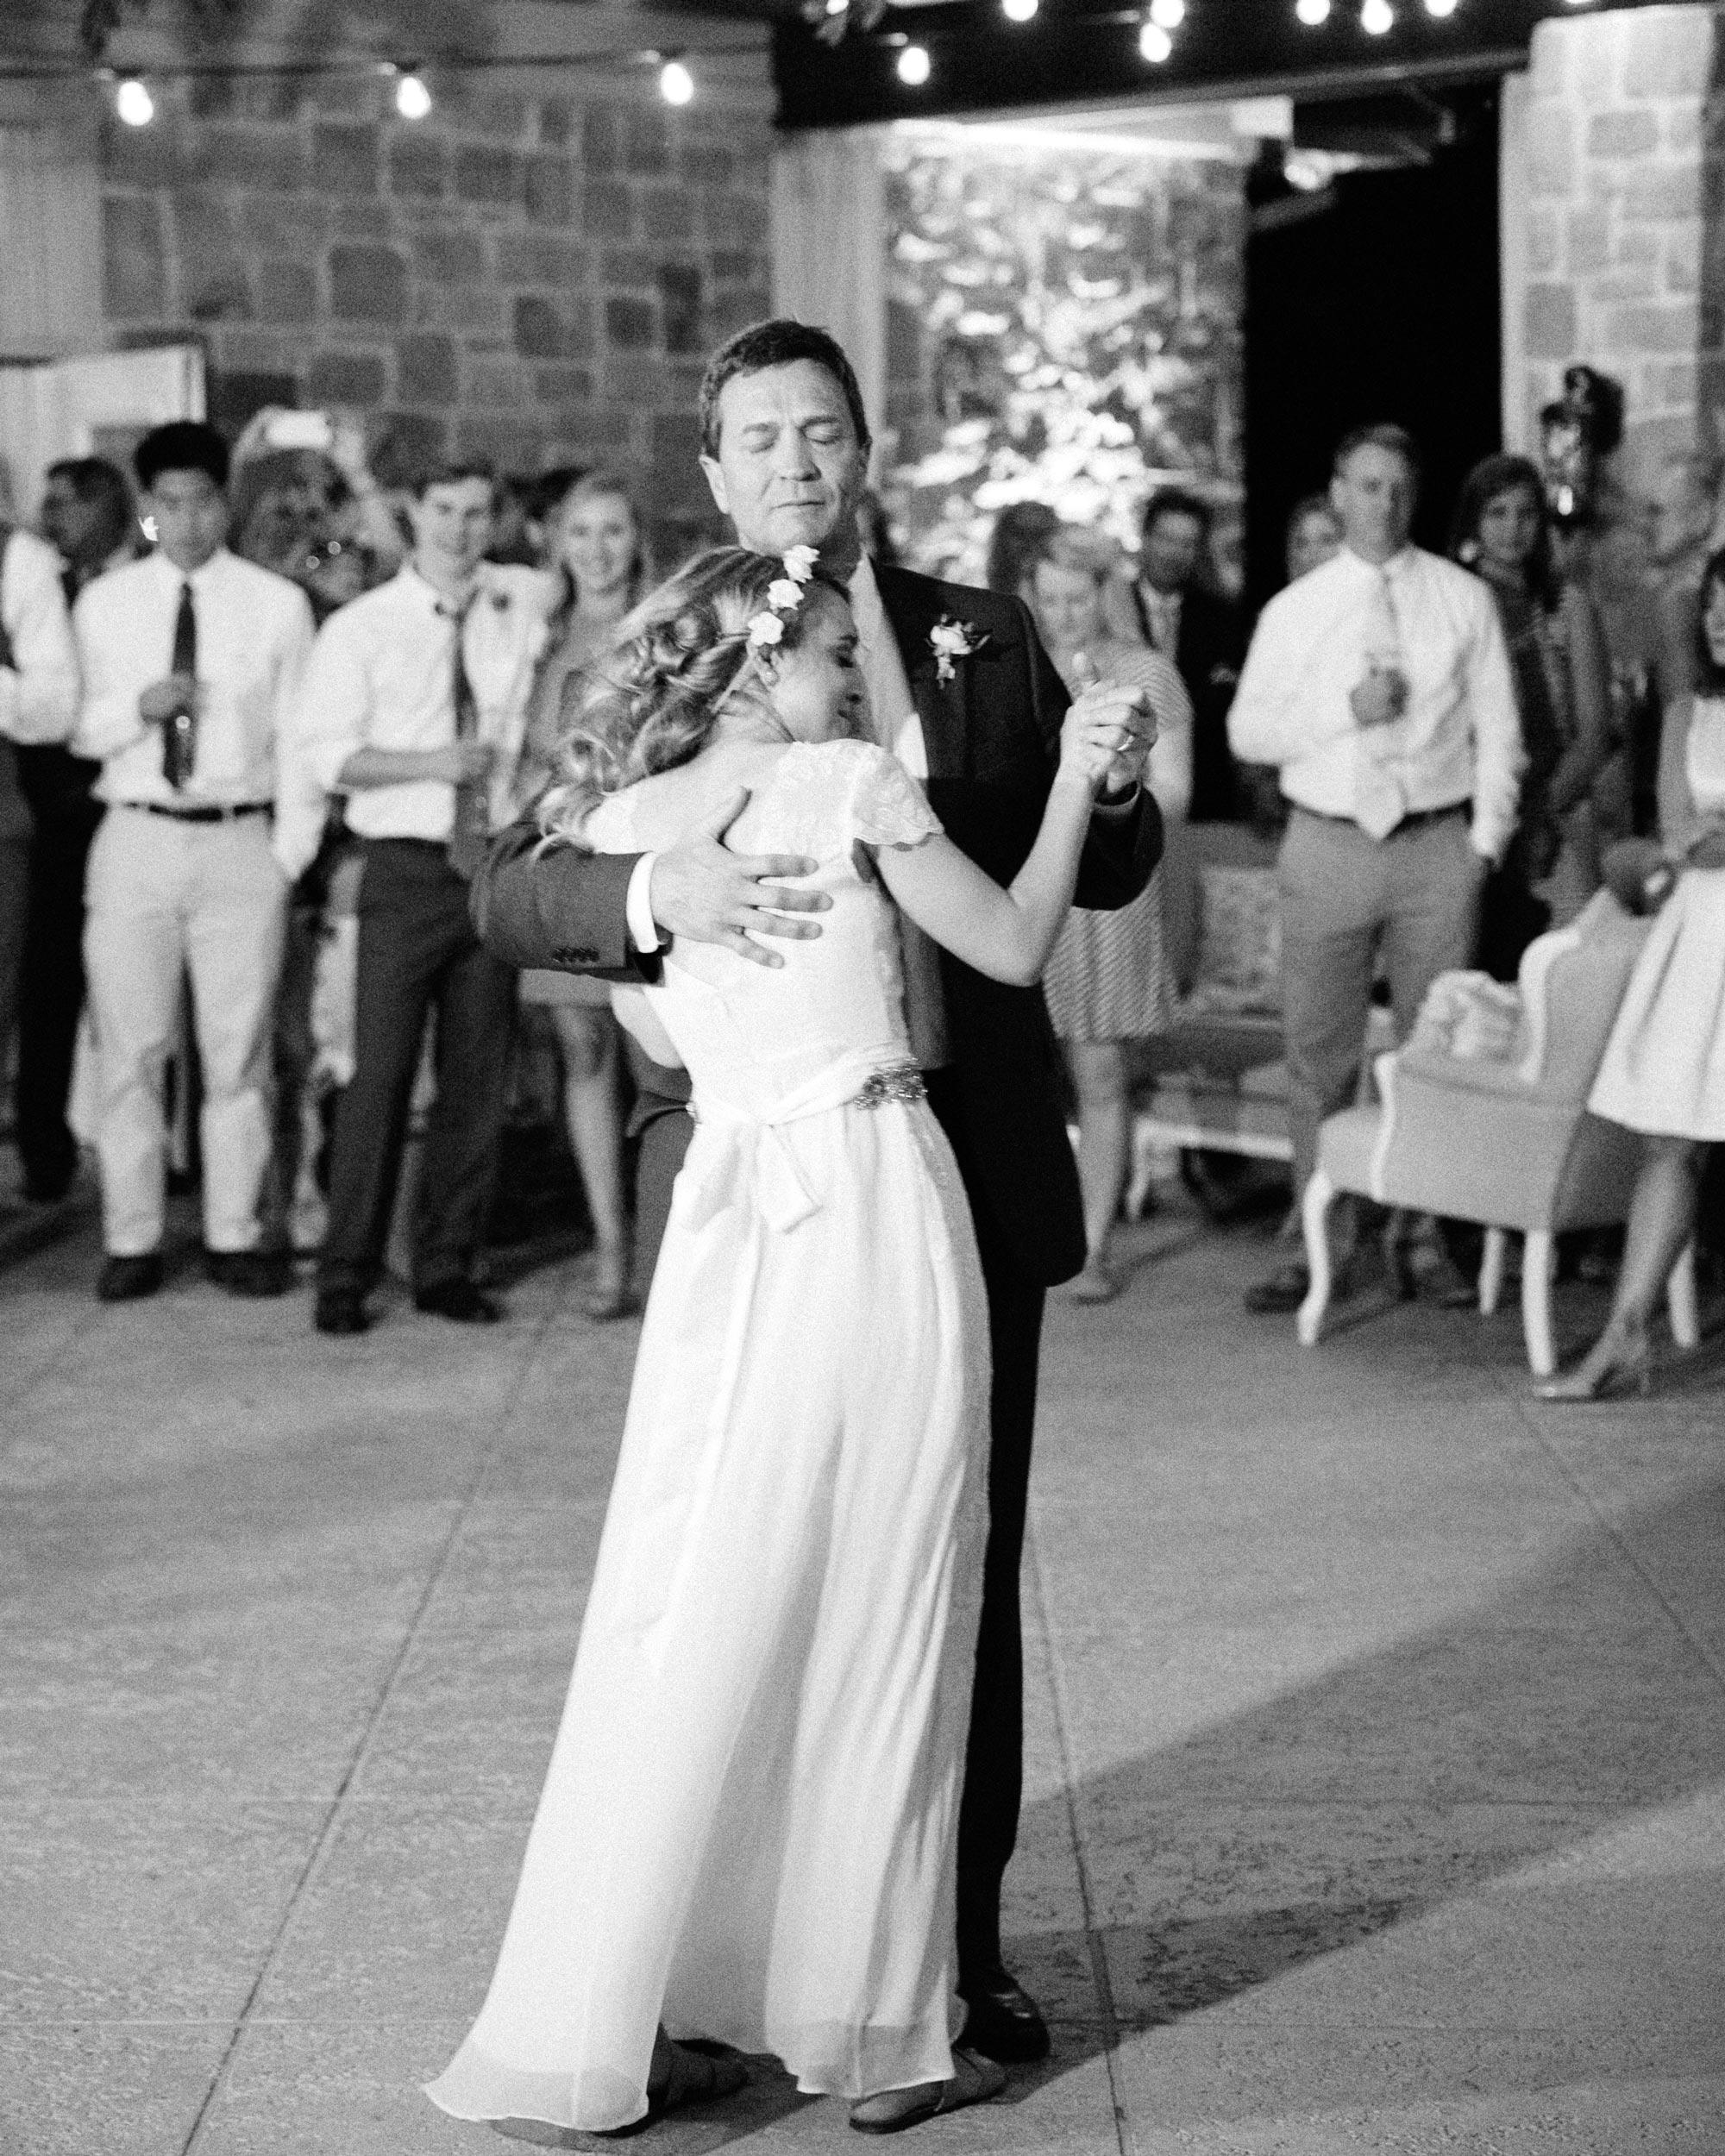 david-tyler-real-wedding-daddy-daughter-dance.jpg